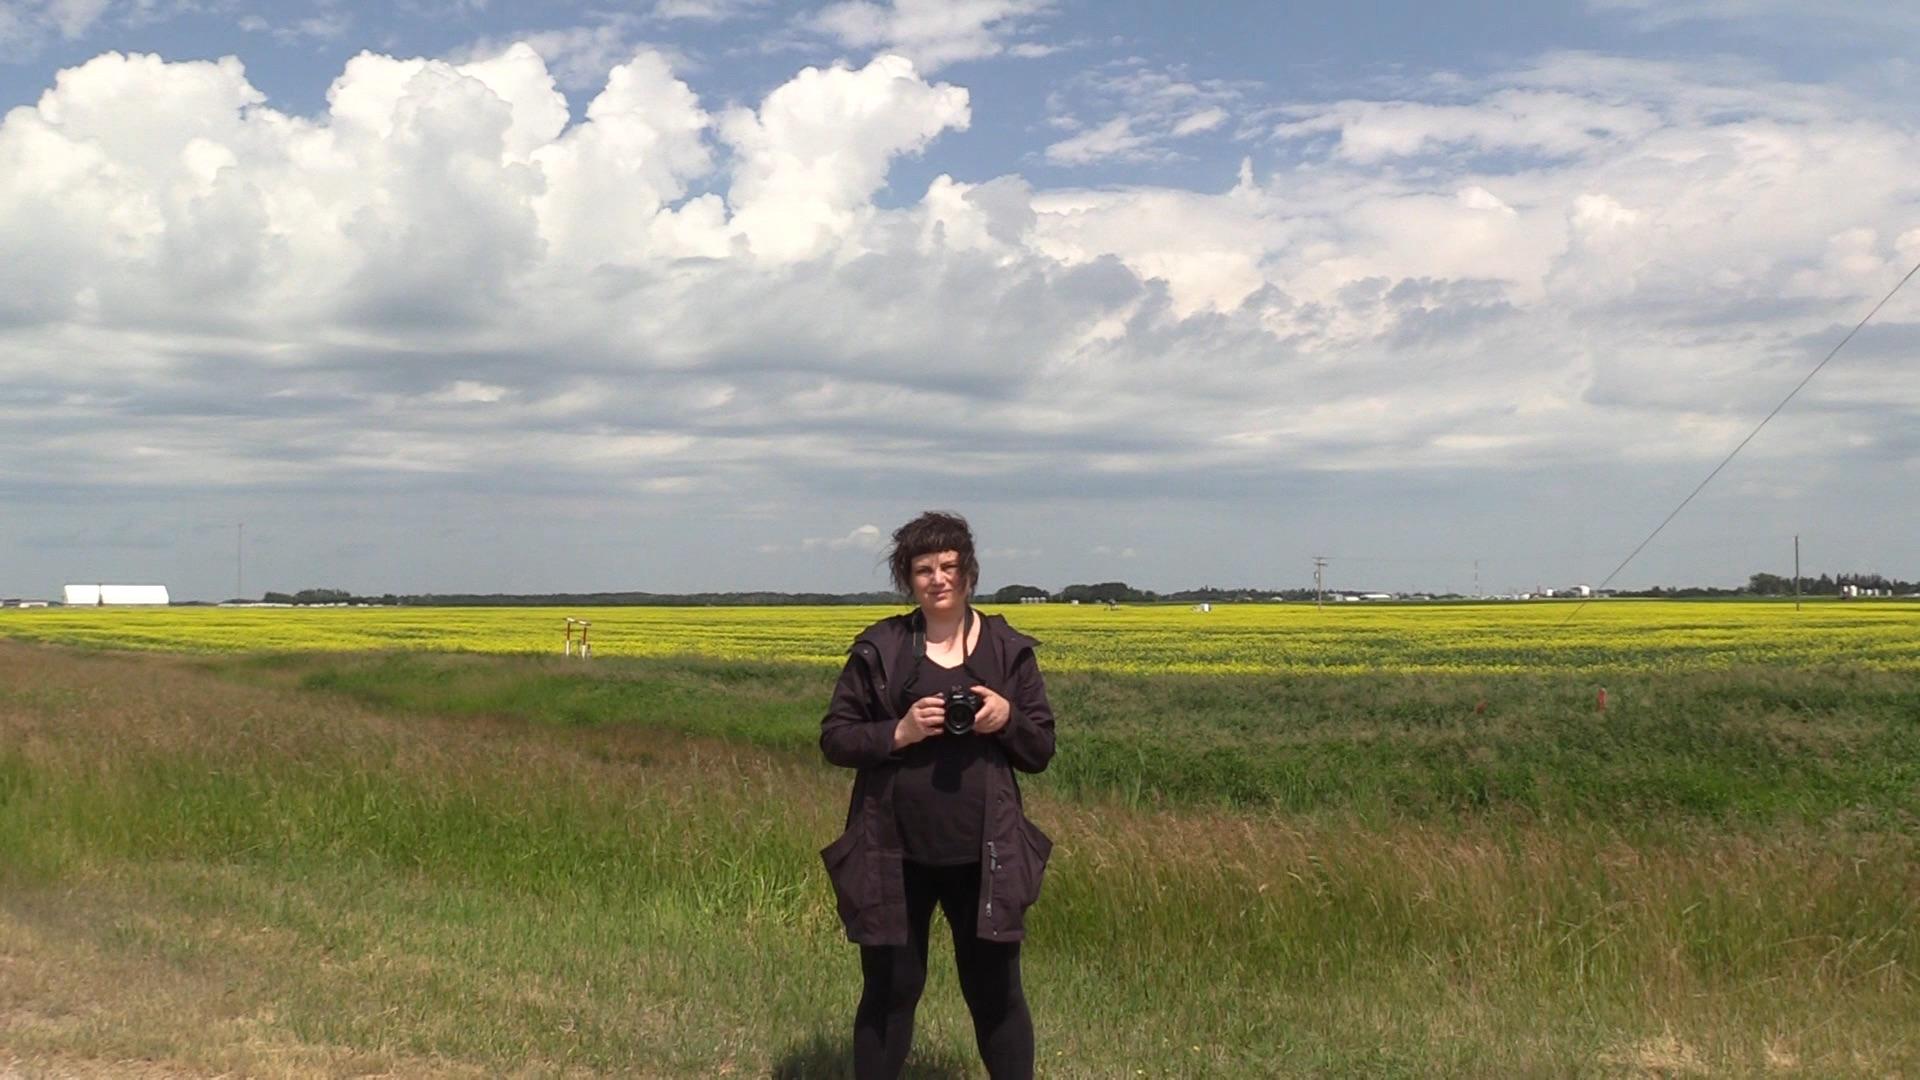 Tanya Kalmanovitch Pipeline Canola Field - Credit Tanya Kalmanovitch 2017.jpg